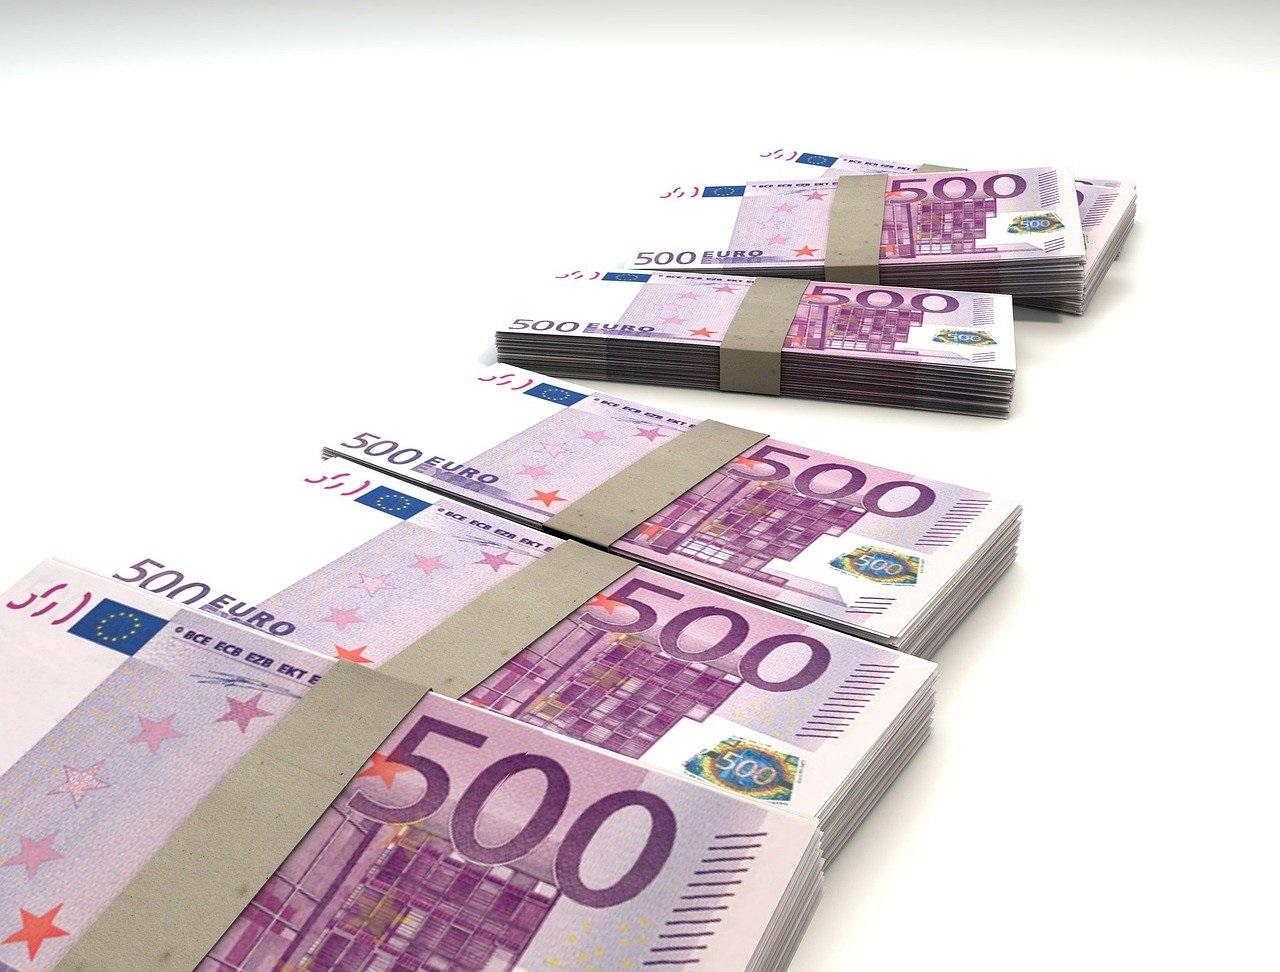 Se dau bani pentru români! Cine poate primi 15000 de euro nerambursabili